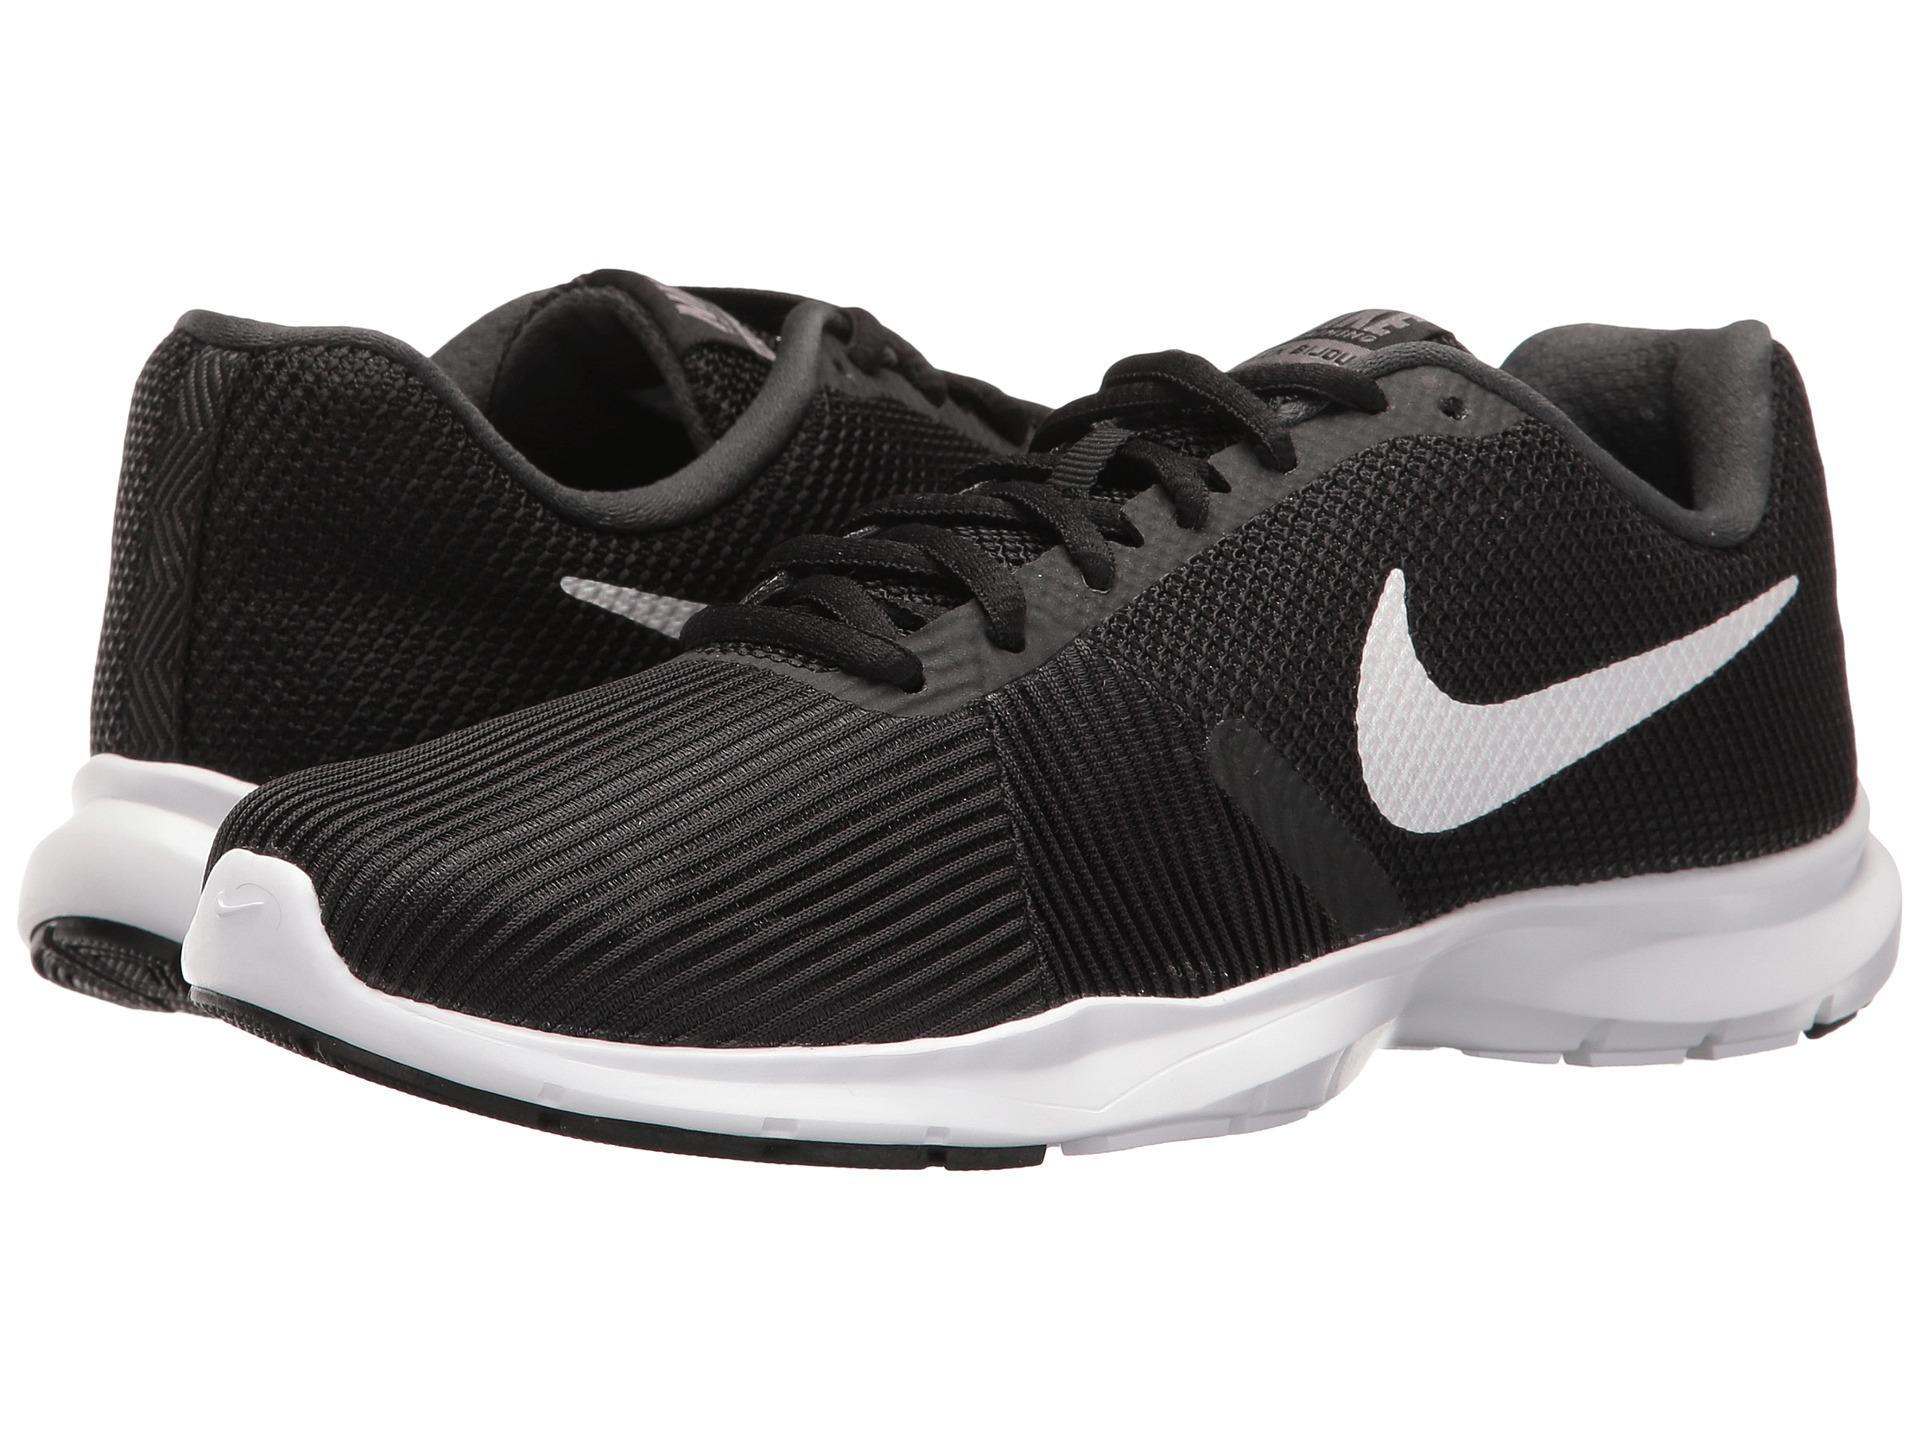 Nike for women running shoes white